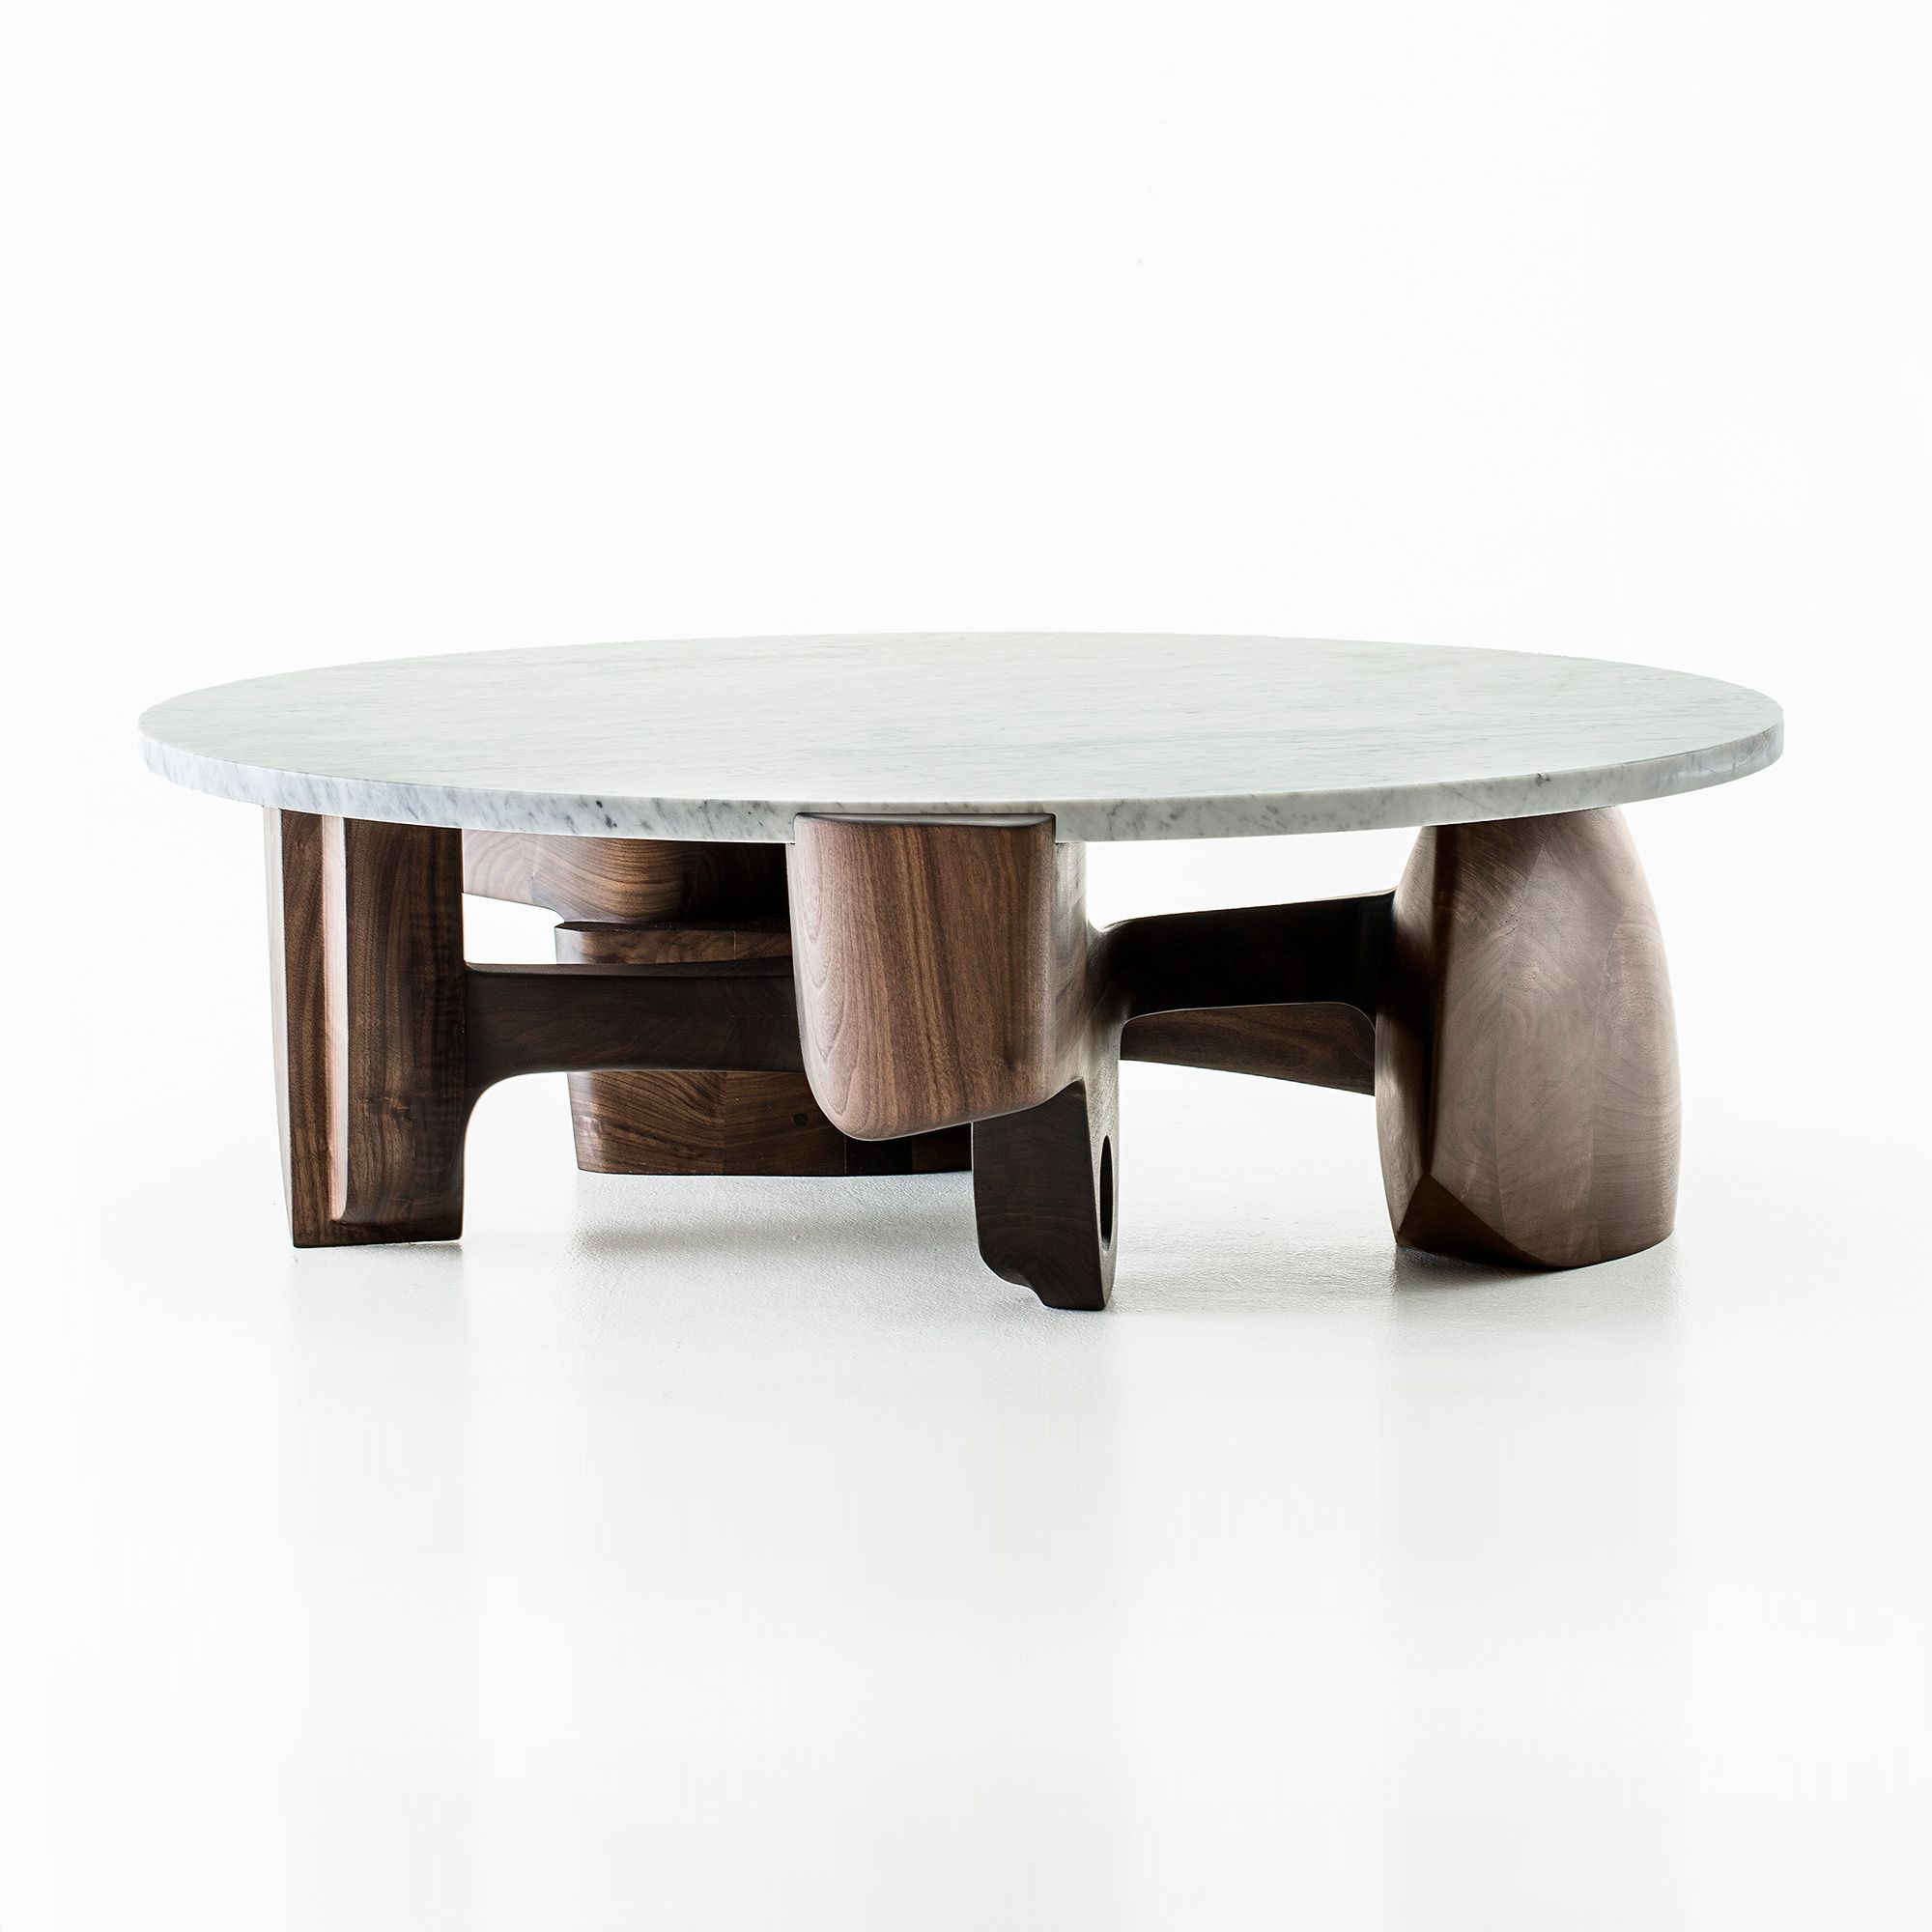 Harlow Cocktail Table - CASTE Design